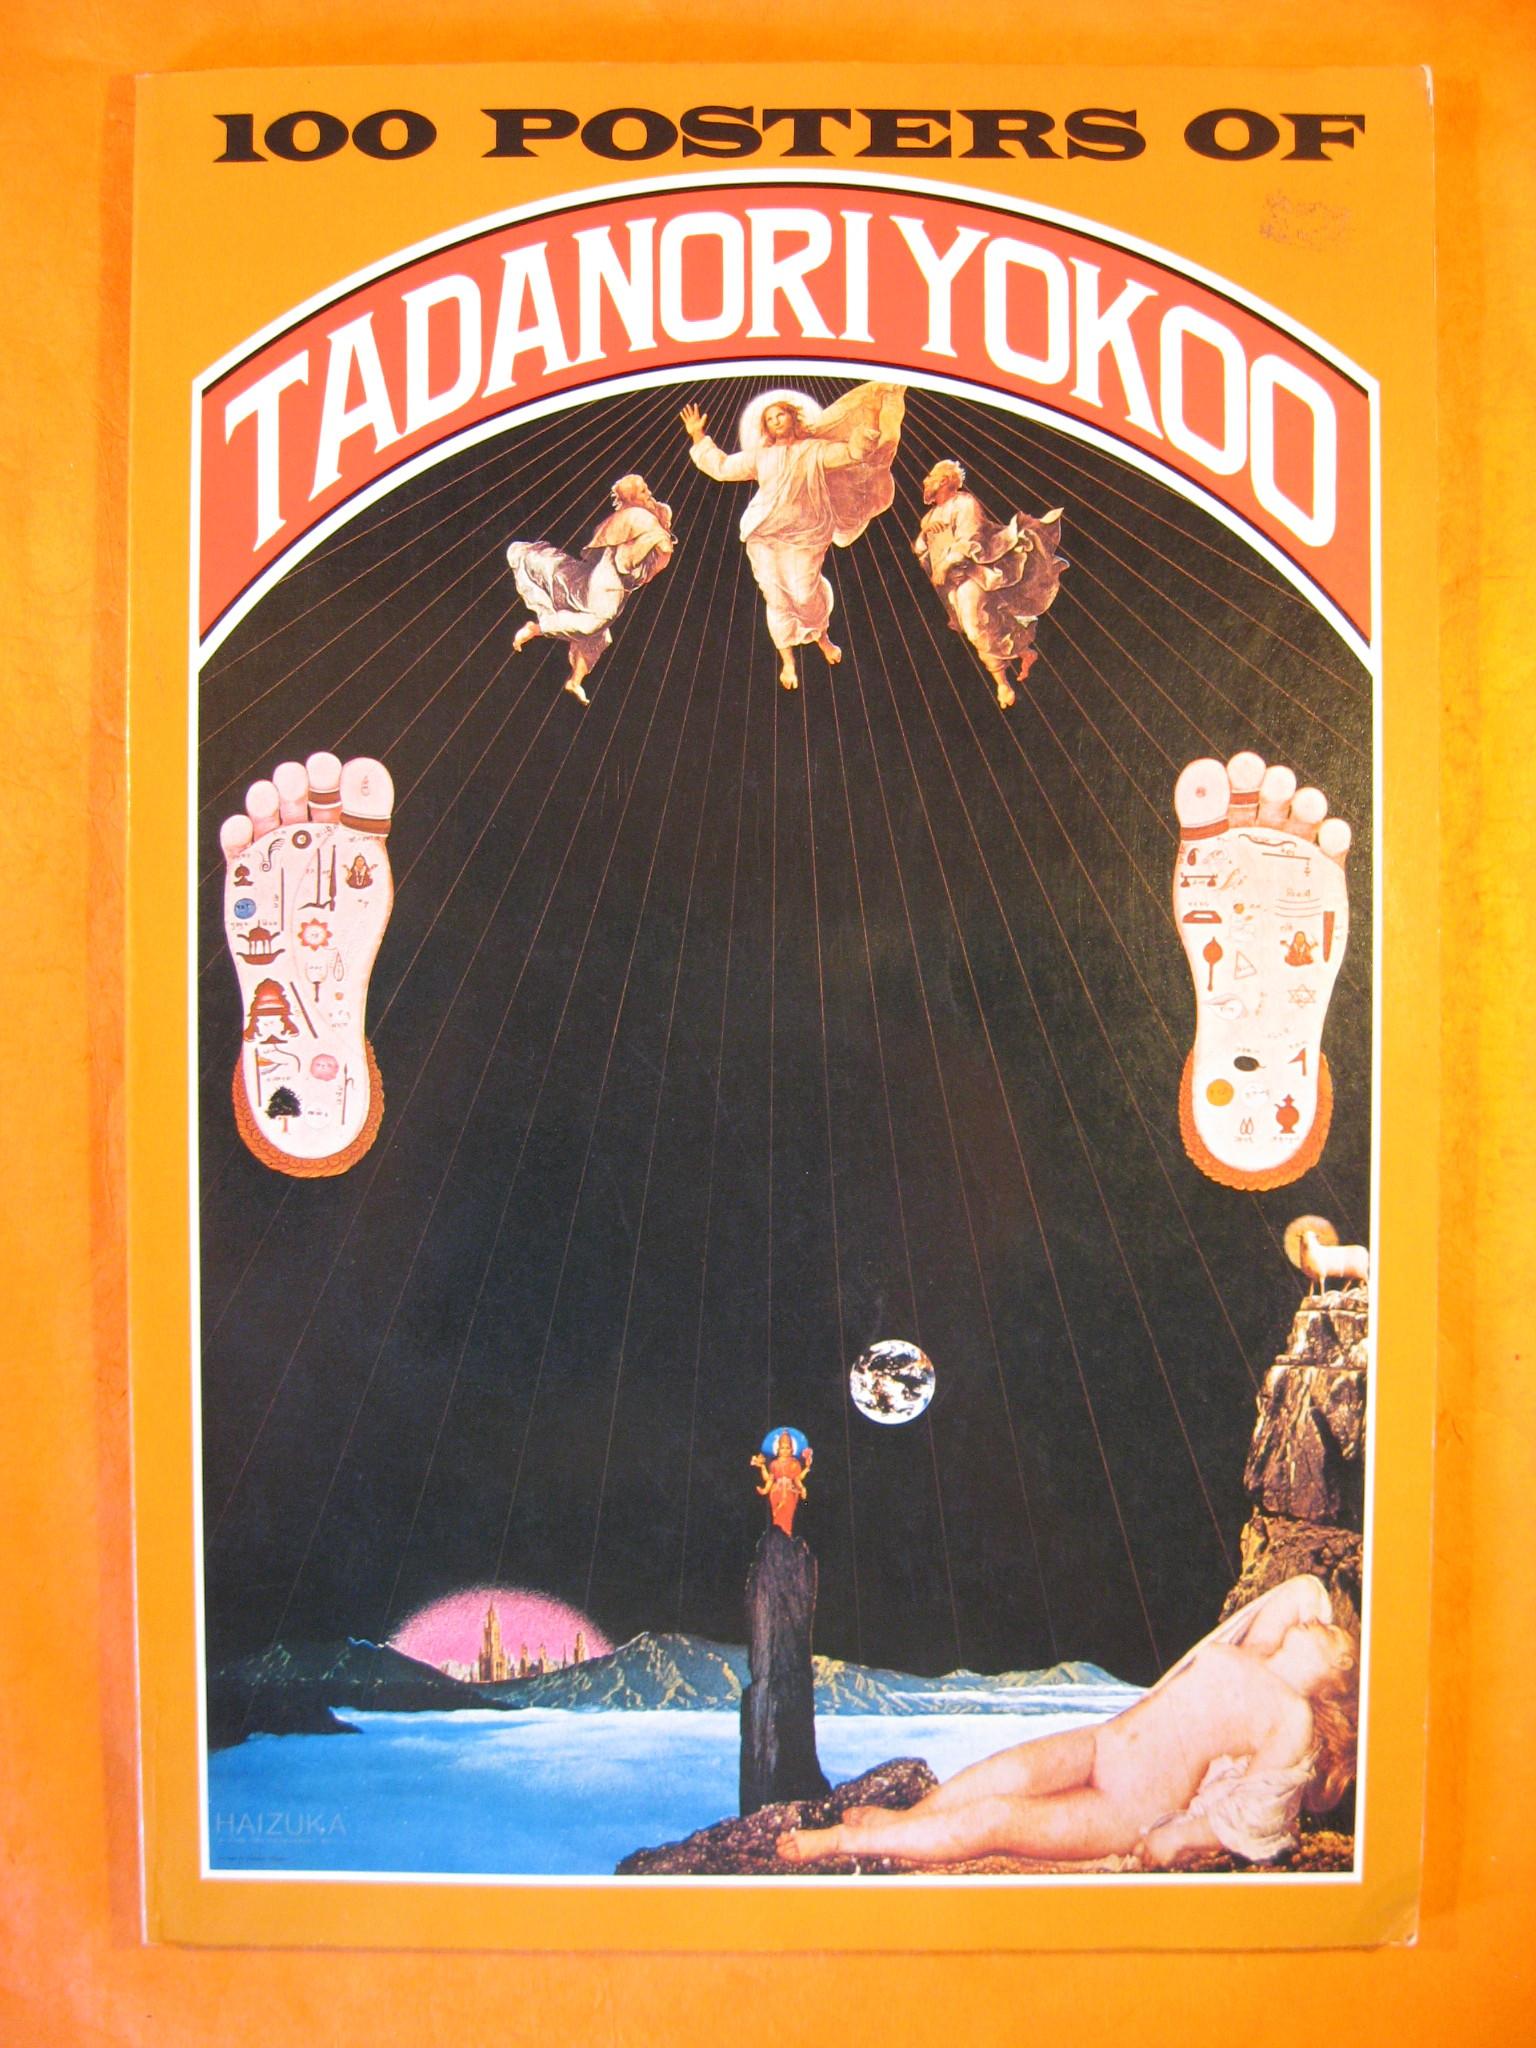 100 Posters of Tadanori Yokoo, Tadanori Yokoo; Koichi Tanikawa